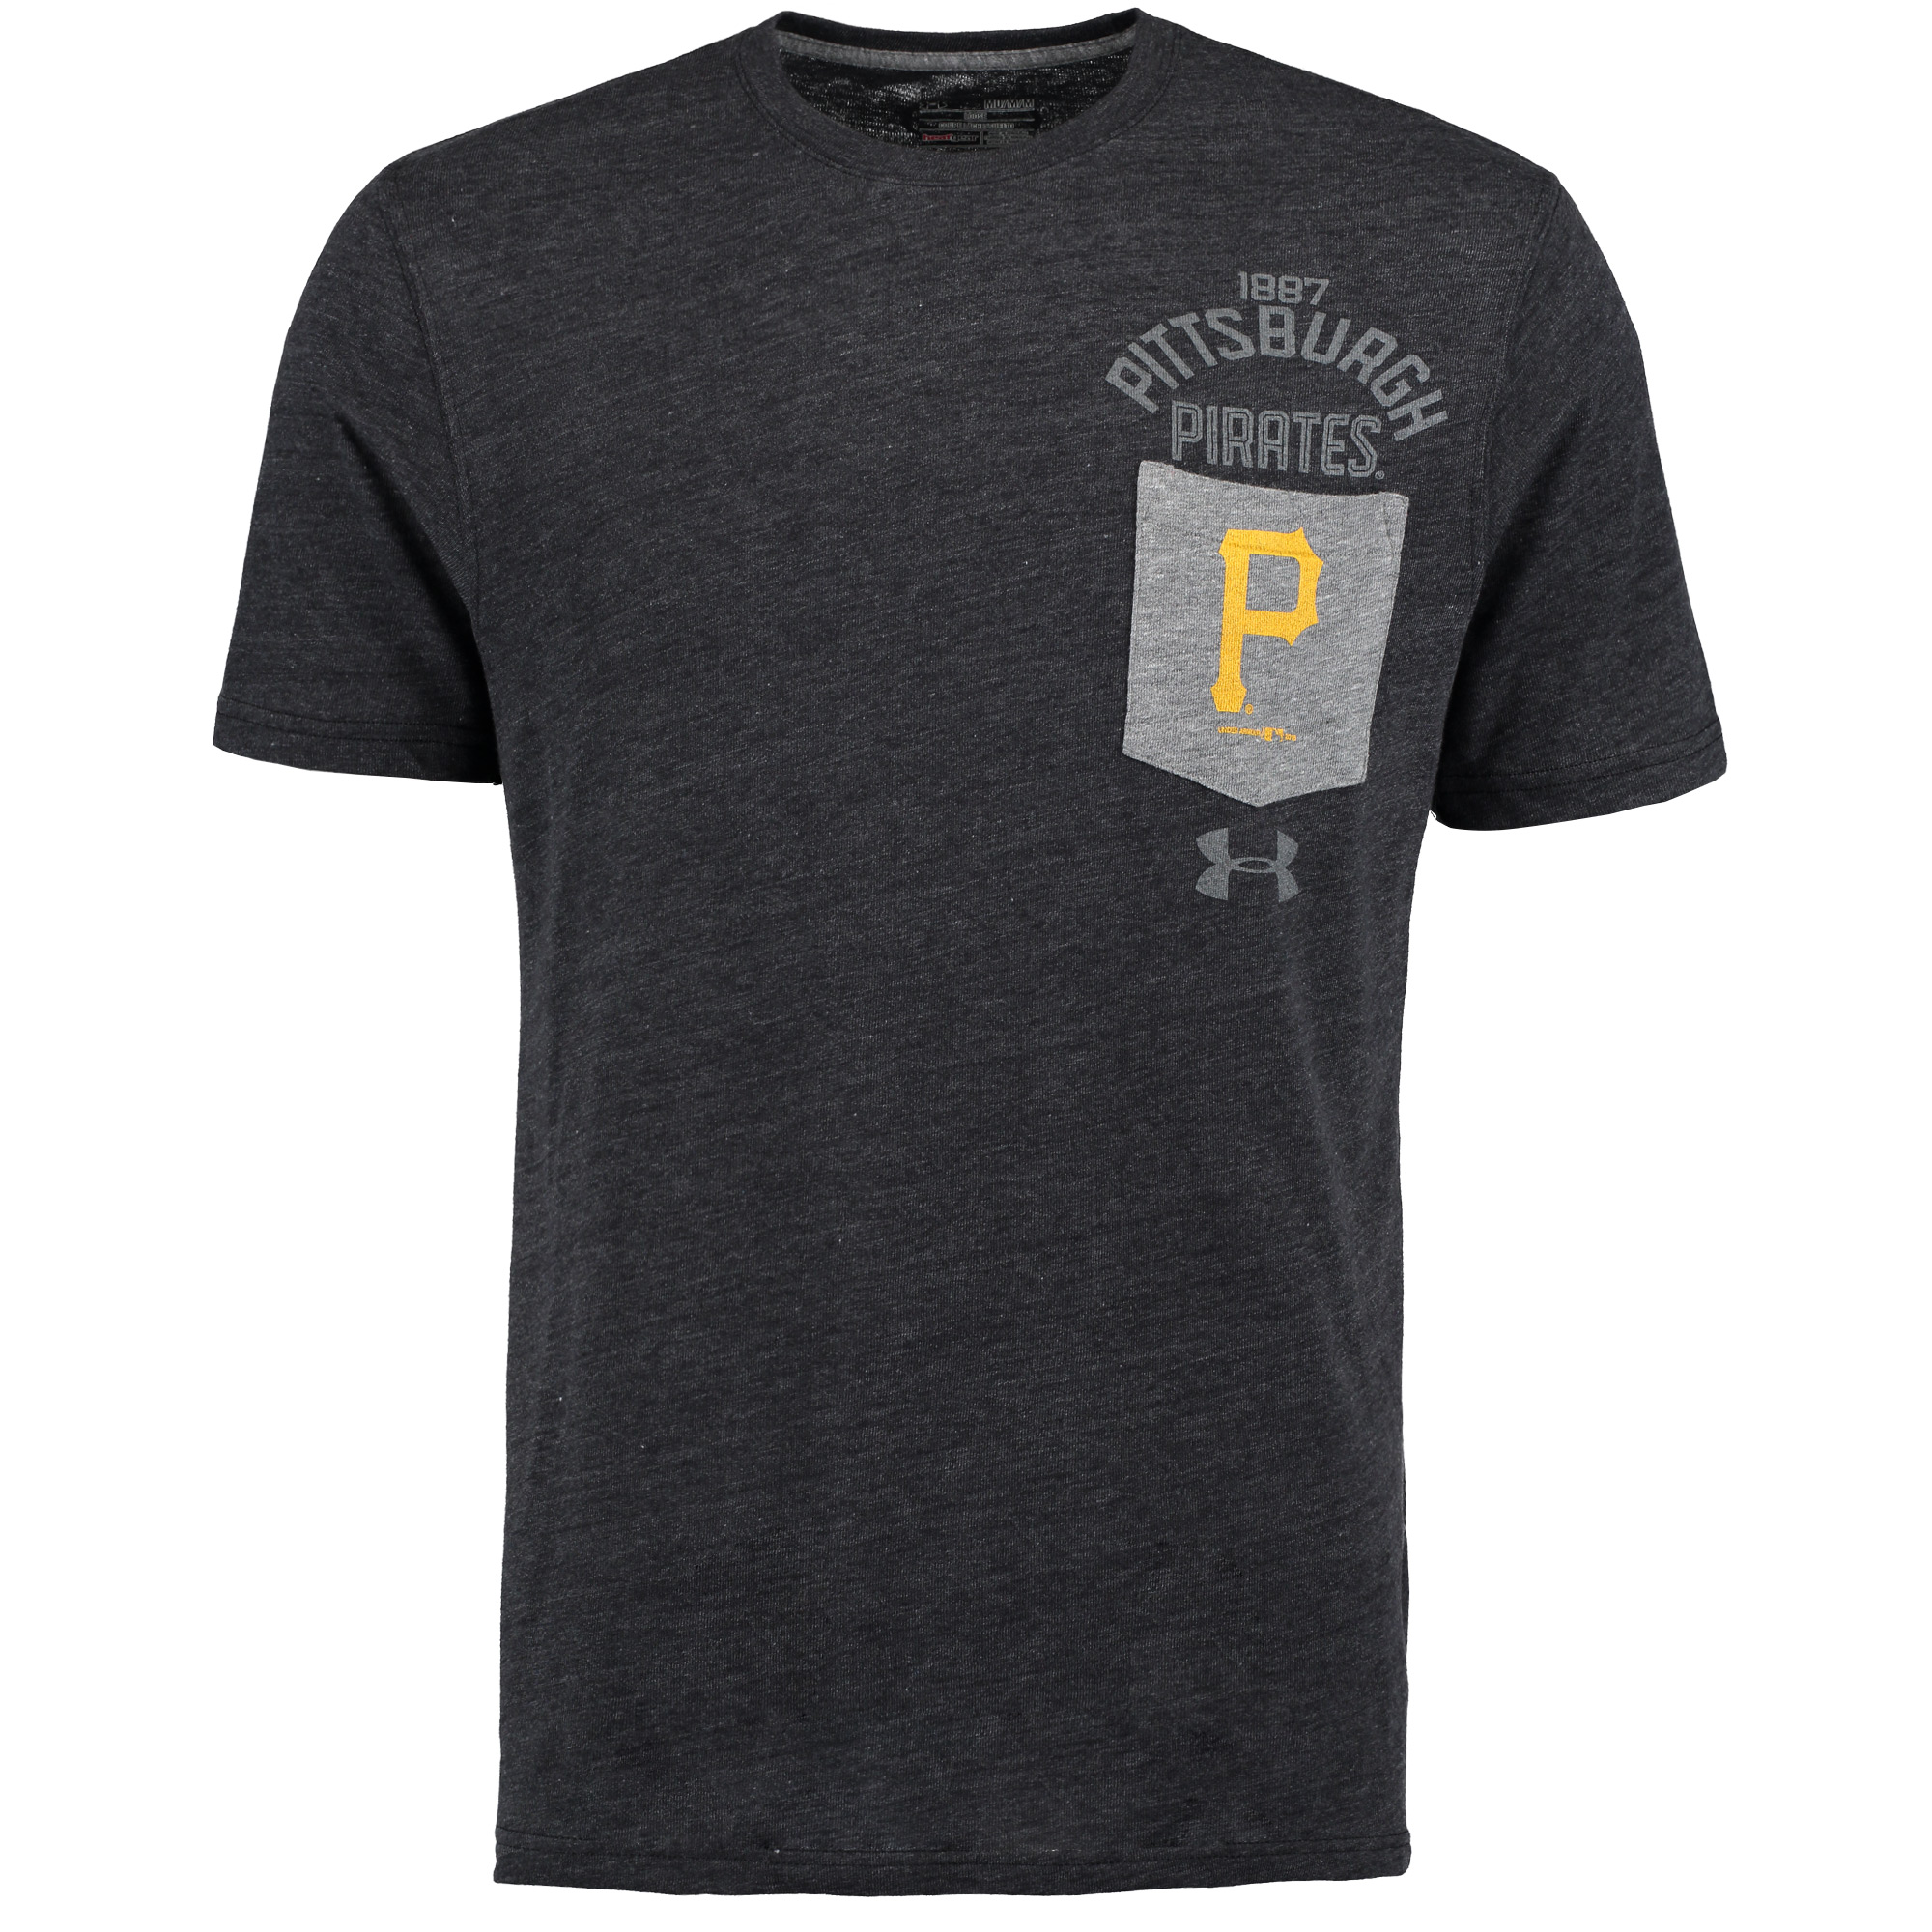 Pittsburgh Pirates Under Armour Tri-Blend Pocket Performance T-Shirt - Black